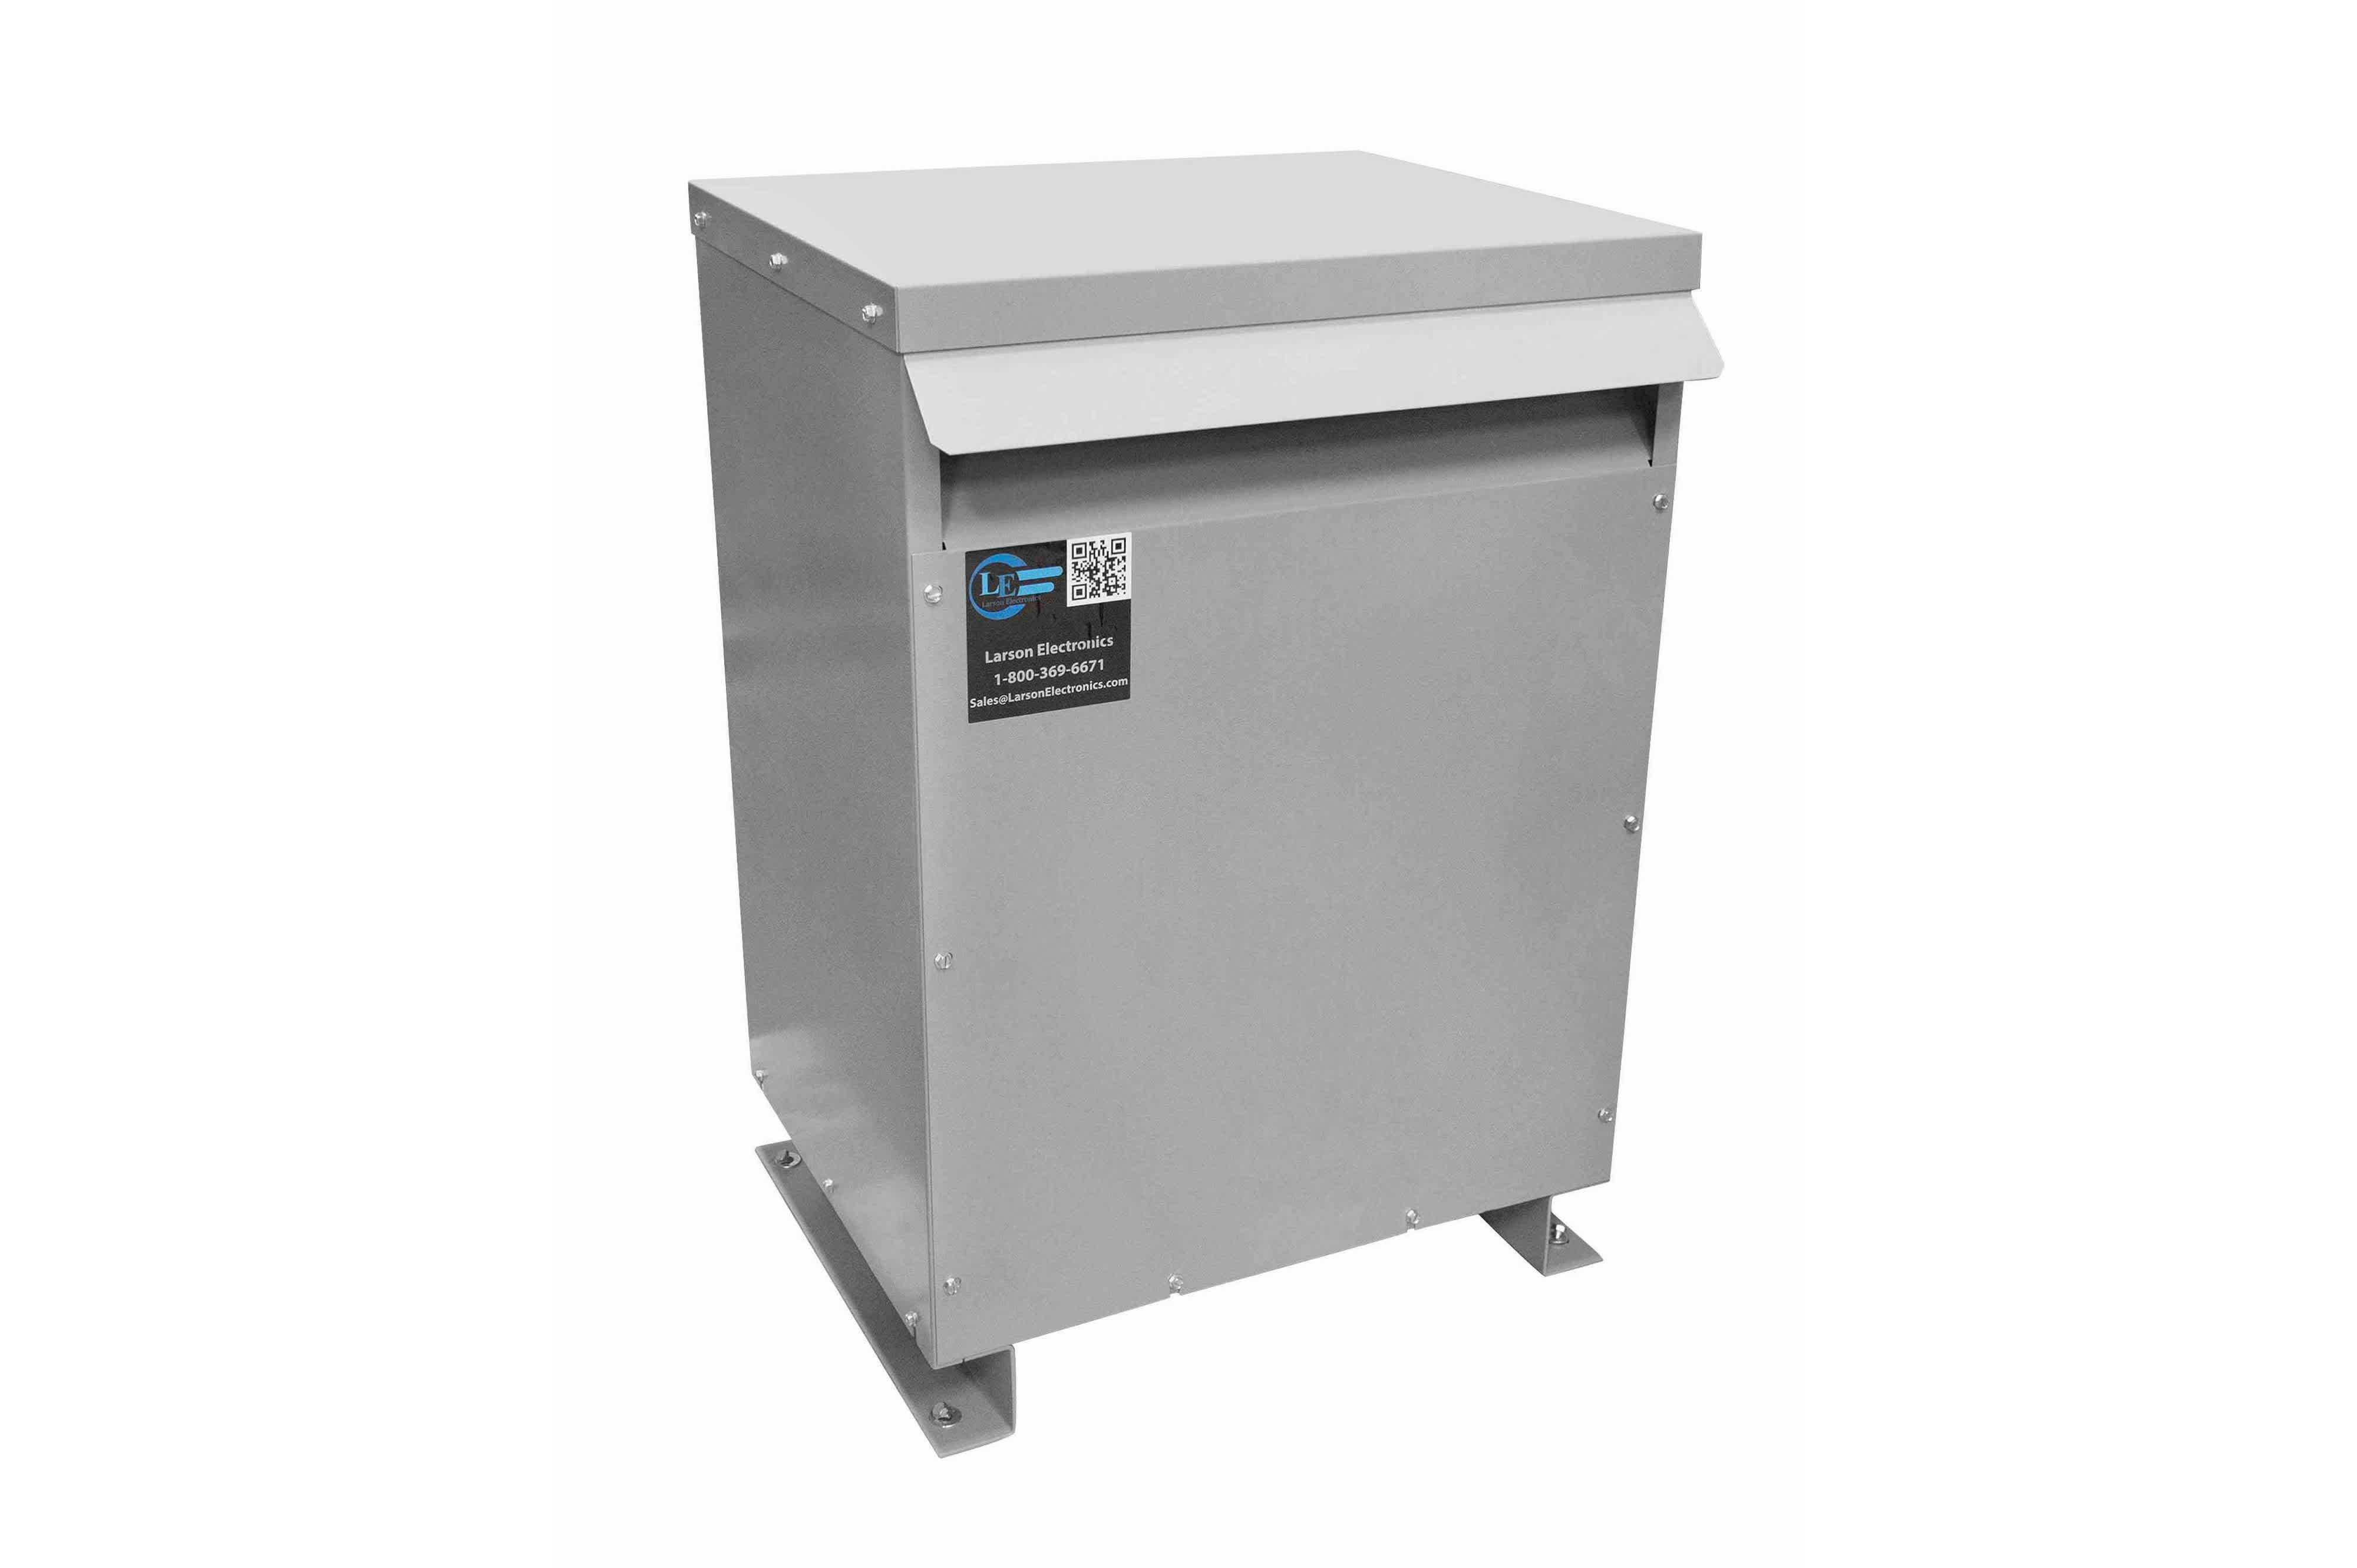 52.5 kVA 3PH Isolation Transformer, 575V Wye Primary, 480V Delta Secondary, N3R, Ventilated, 60 Hz